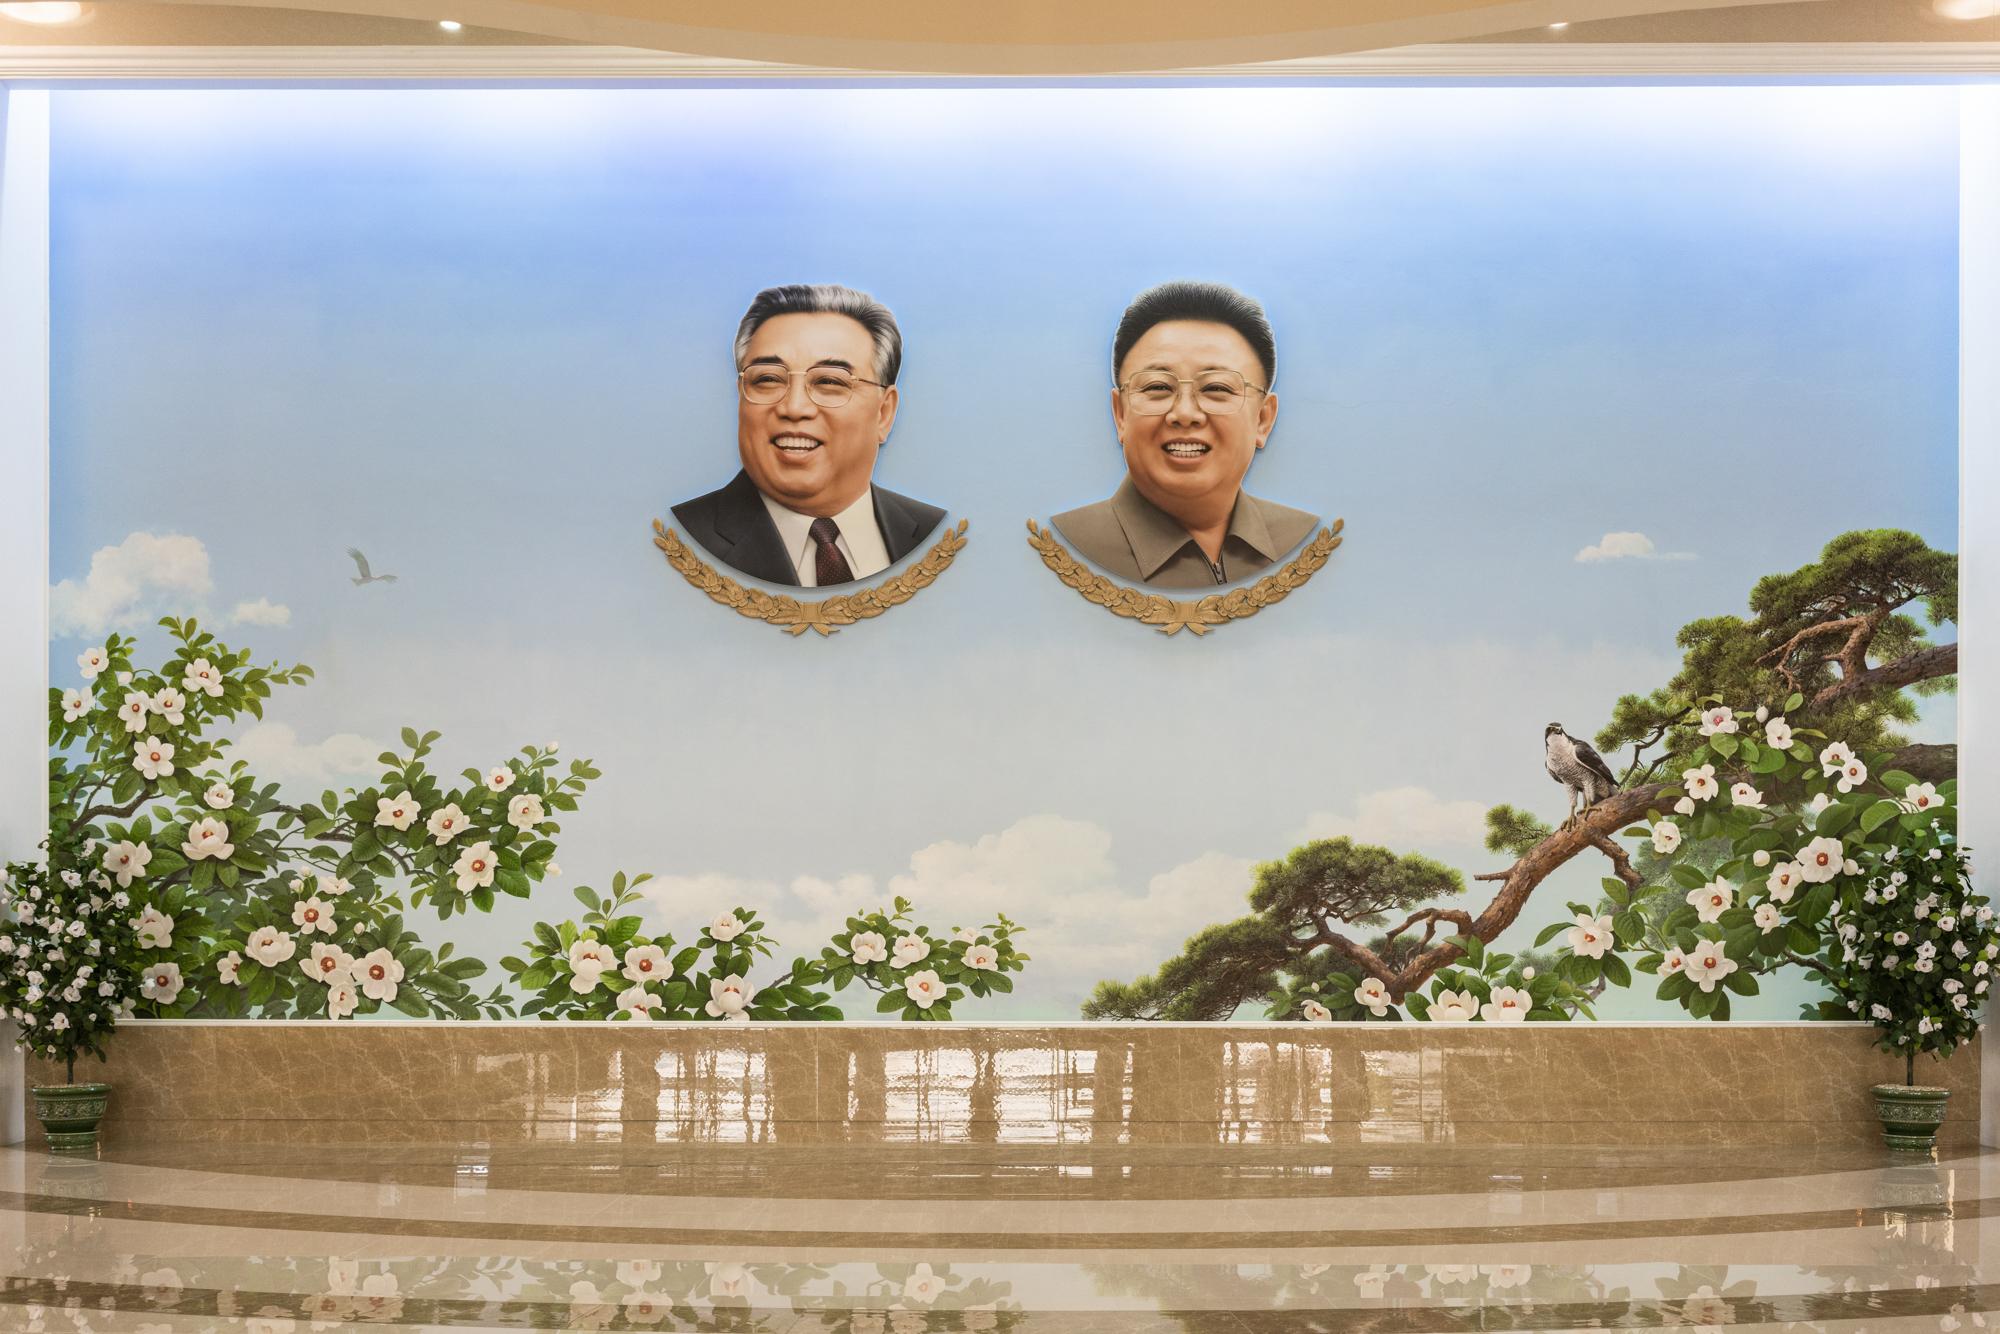 NorthKorea_160419_SNY2643_Web.jpg